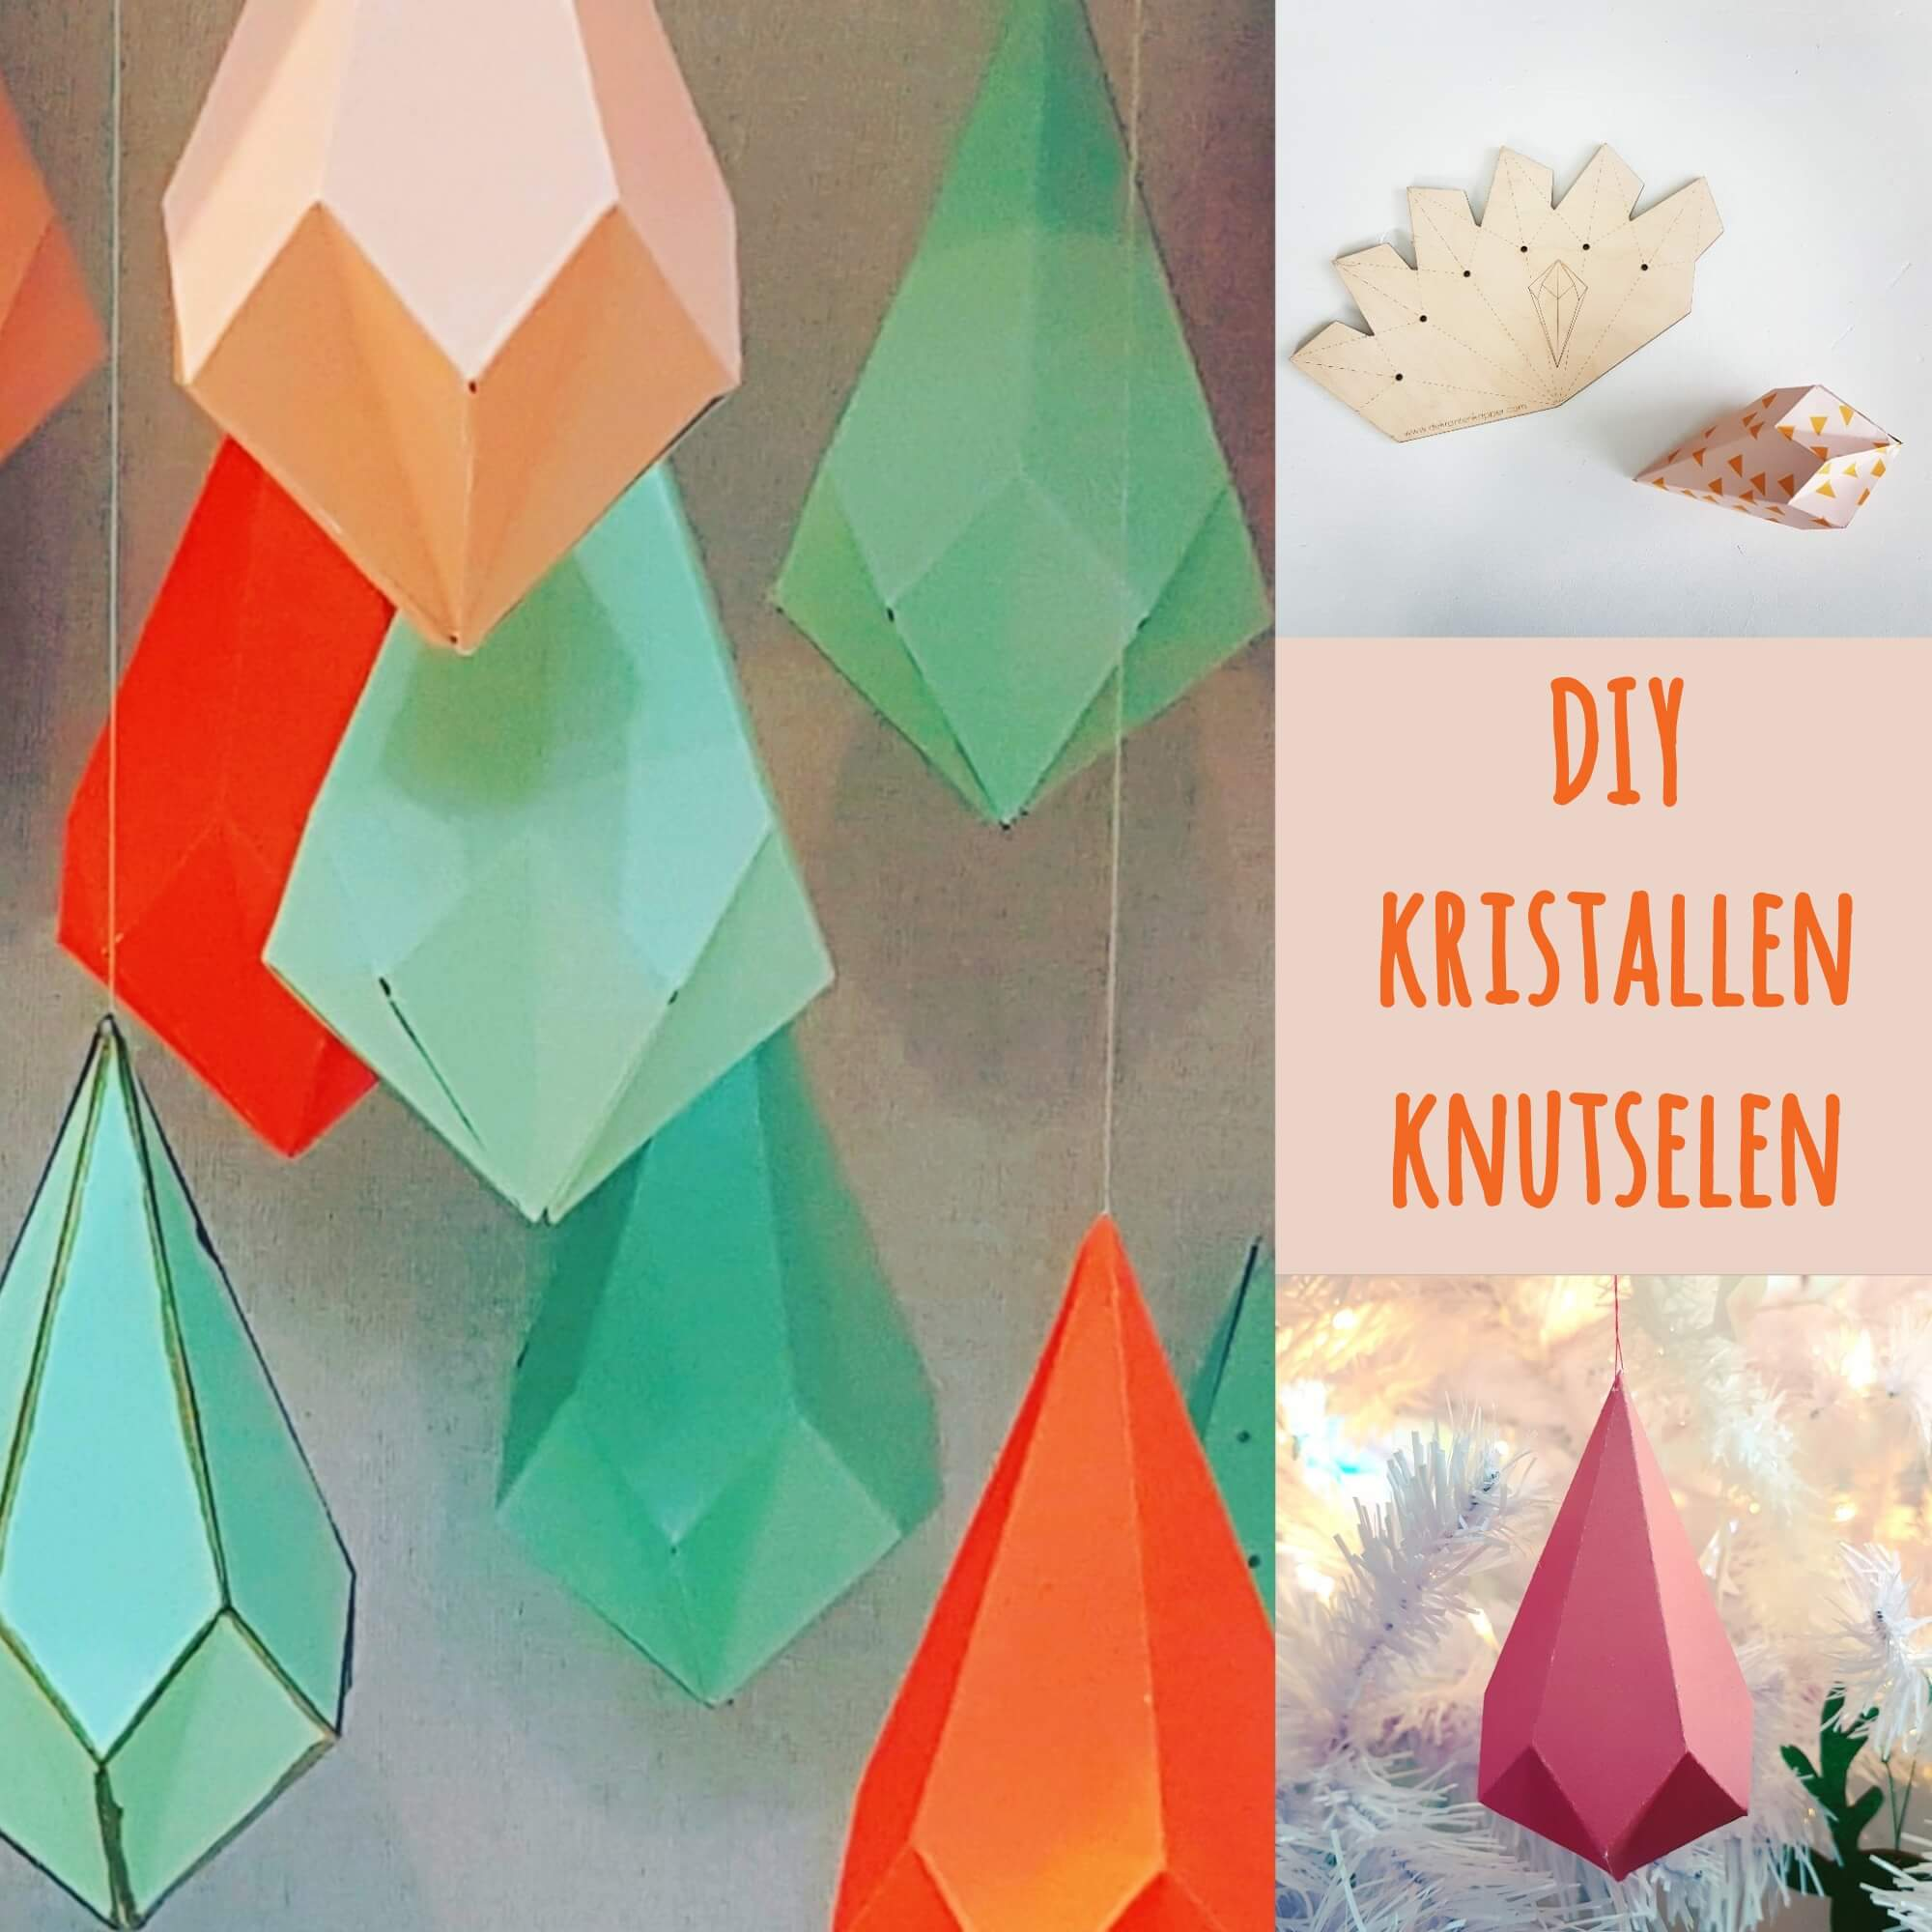 DIY: kristallen knutselen